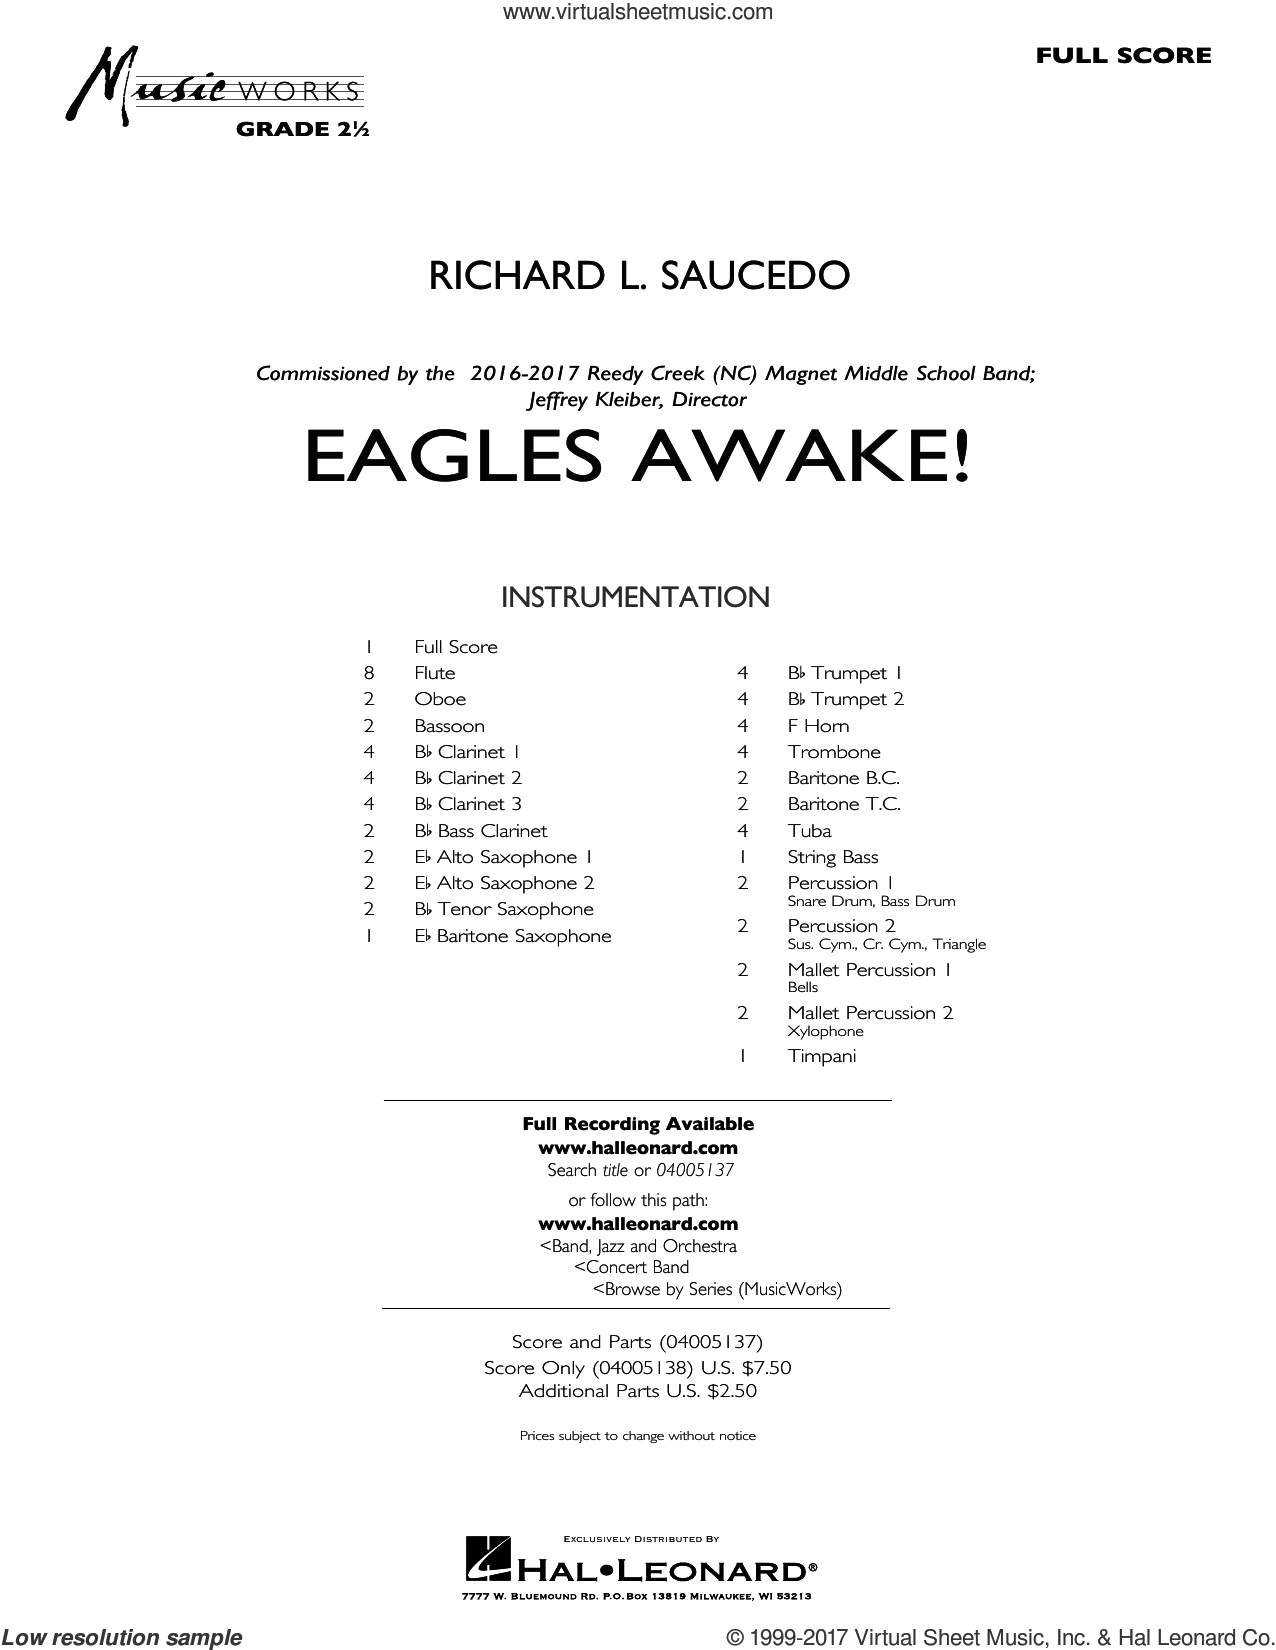 Saucedo - Eagles Awake! sheet music (complete collection) for concert band